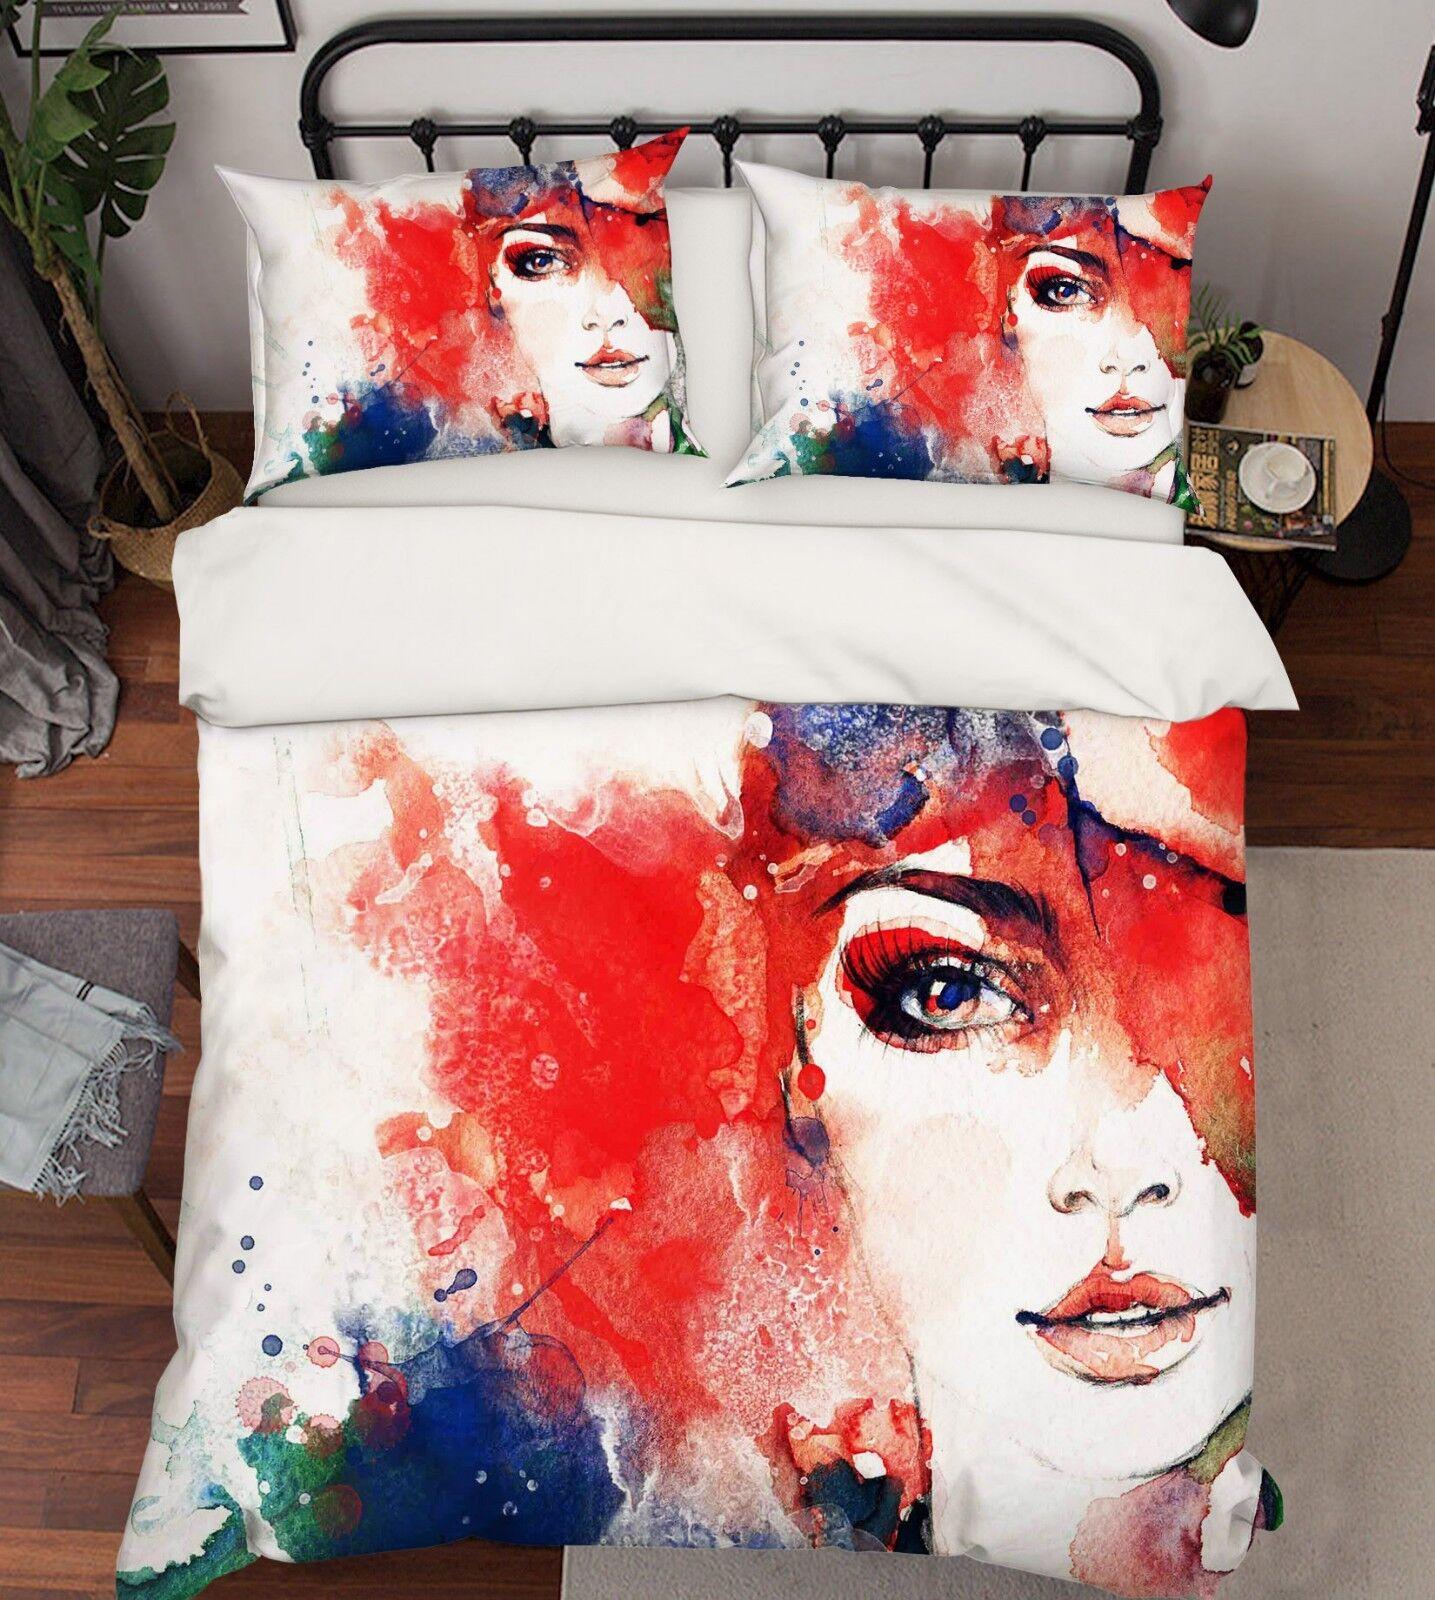 3D Couleur Girl Draws78 Bed PilFaiblecases Quilt Duvet Cover Set Single Queen King CA